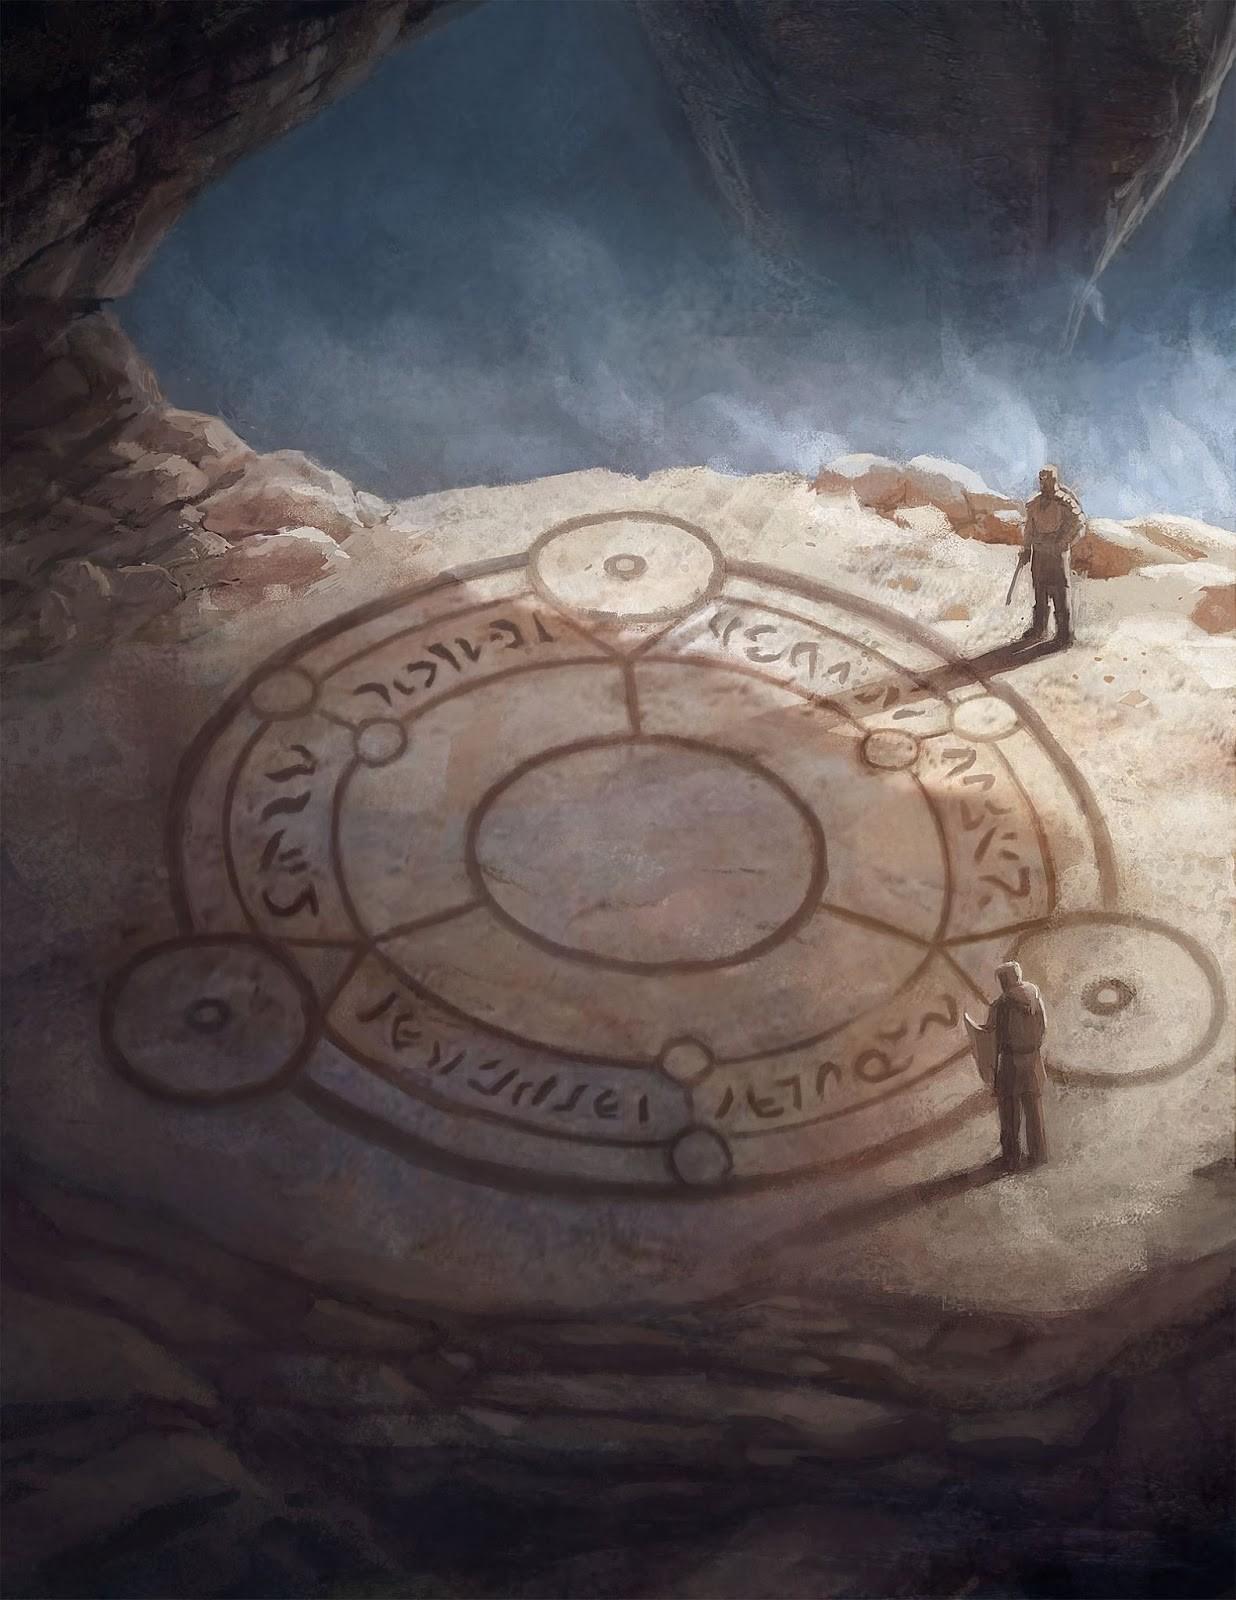 Teleportation circle | Forgotten Realms Wiki | FANDOM